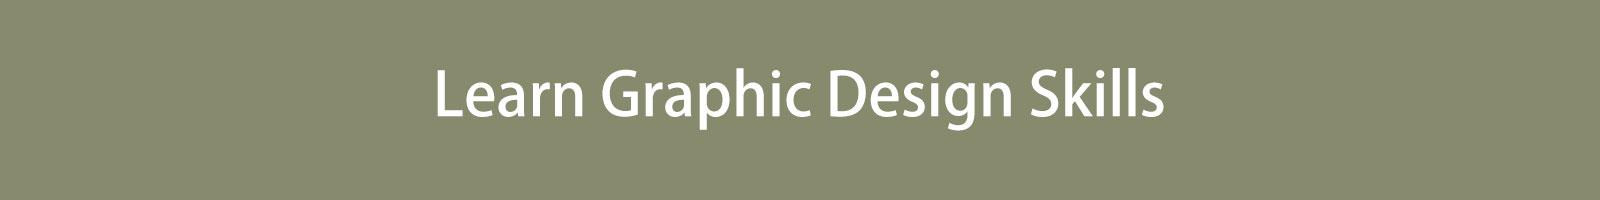 Grapgic Design